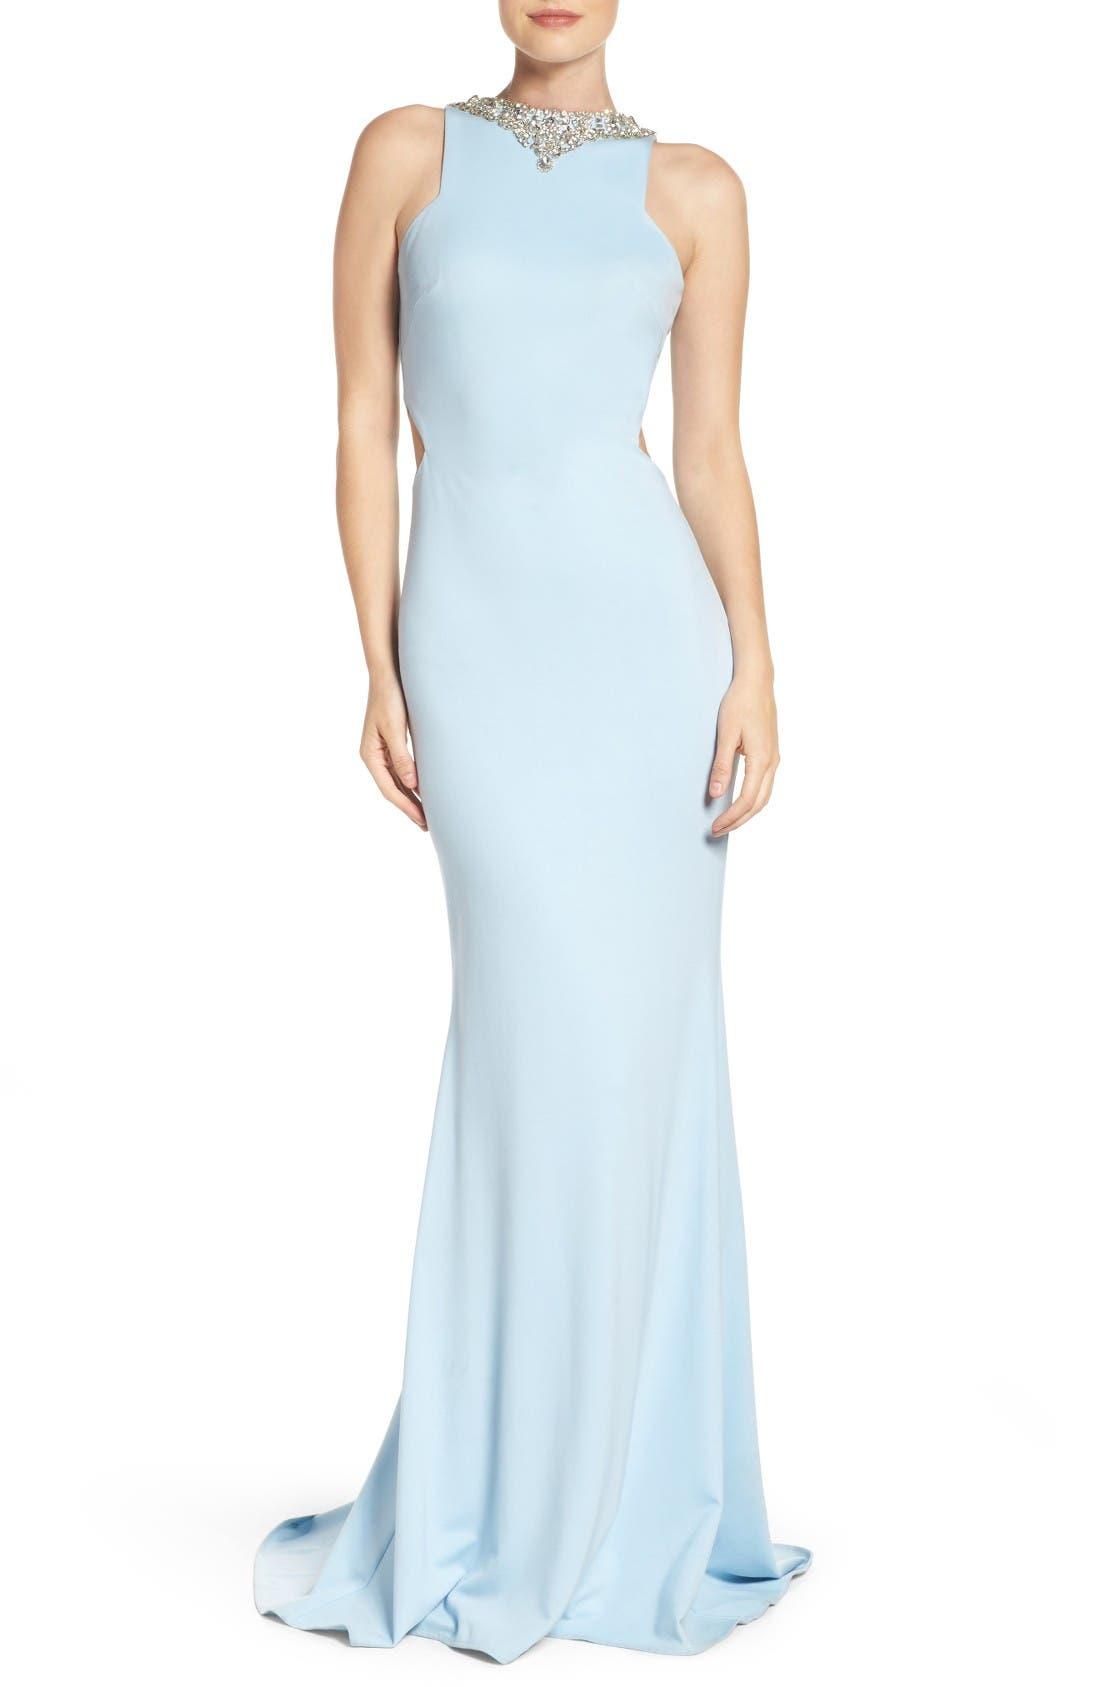 Alternate Image 1 Selected - Mac Duggal Jewel Jersey Gown